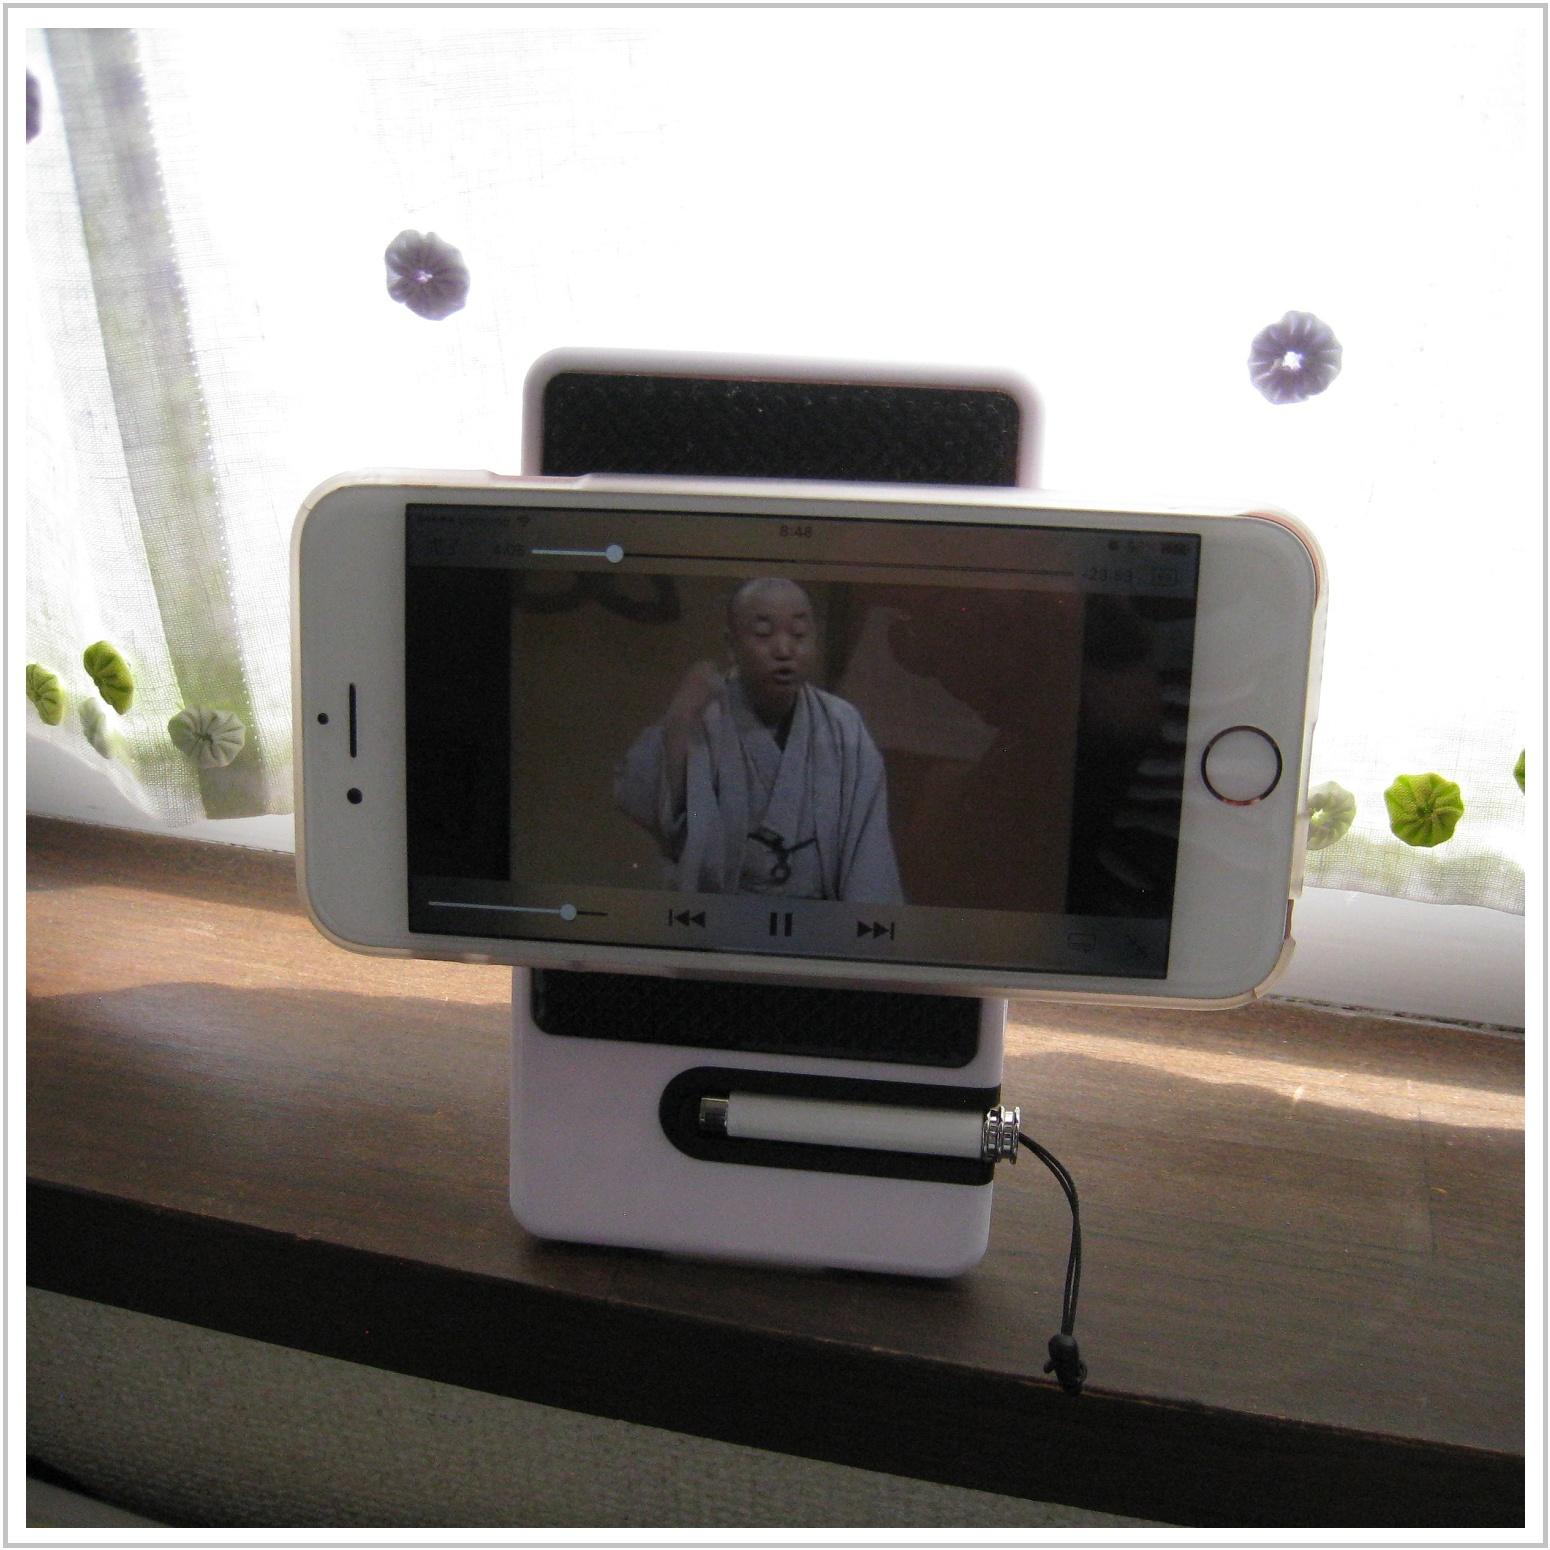 iphone_2_624.jpg